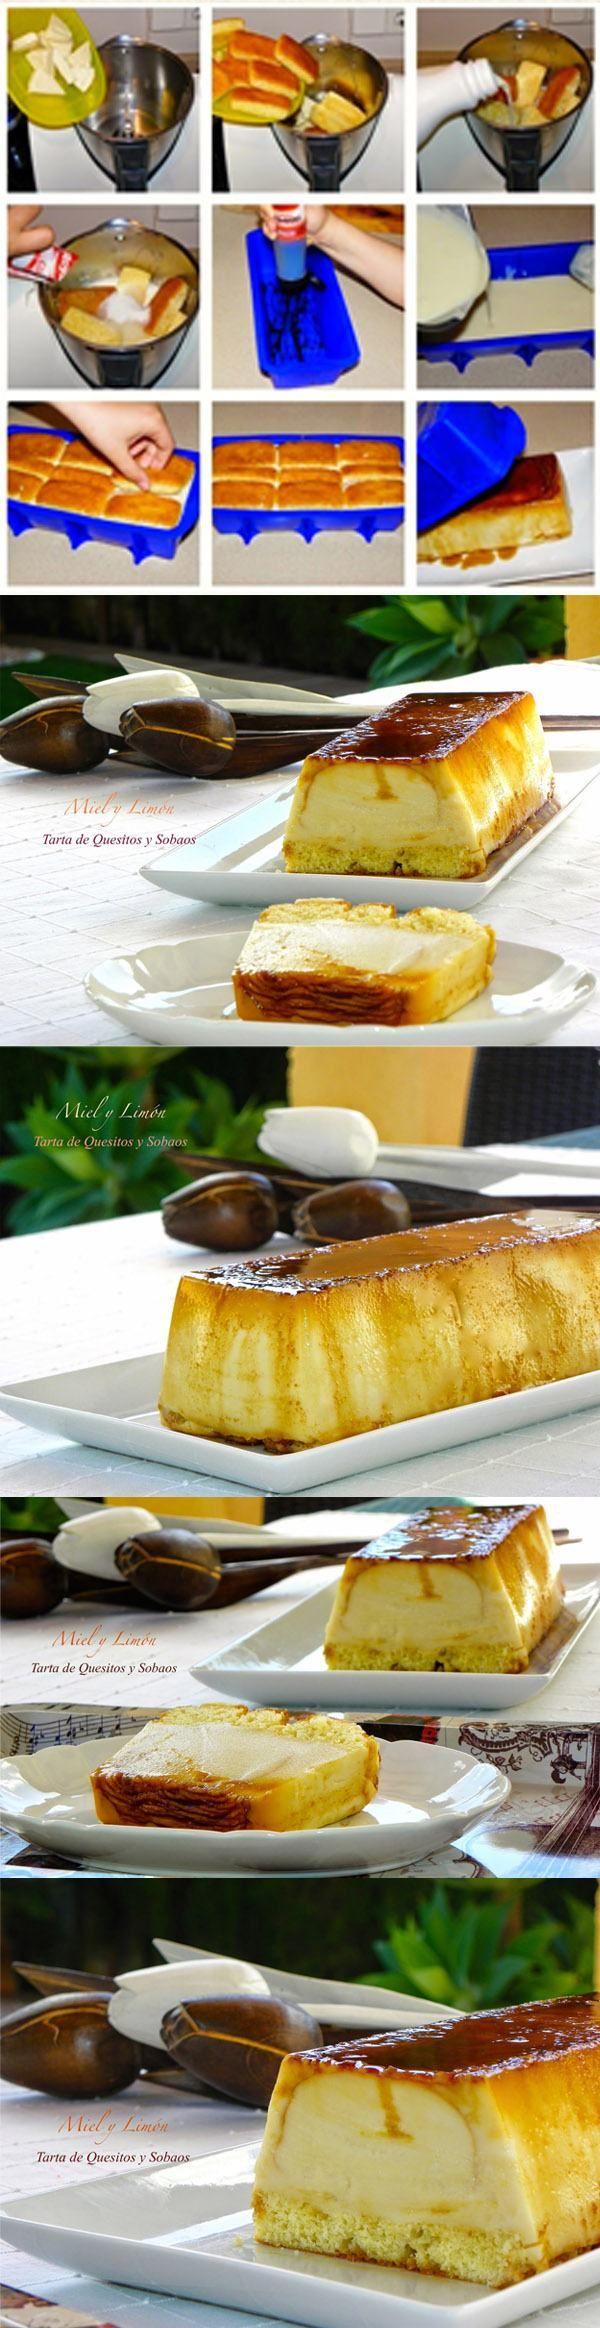 Tarta de quesitos y sobaos thermomix flan and postres tarta de quesitos y sobaos httpmielylimonrecetasspot forumfinder Choice Image